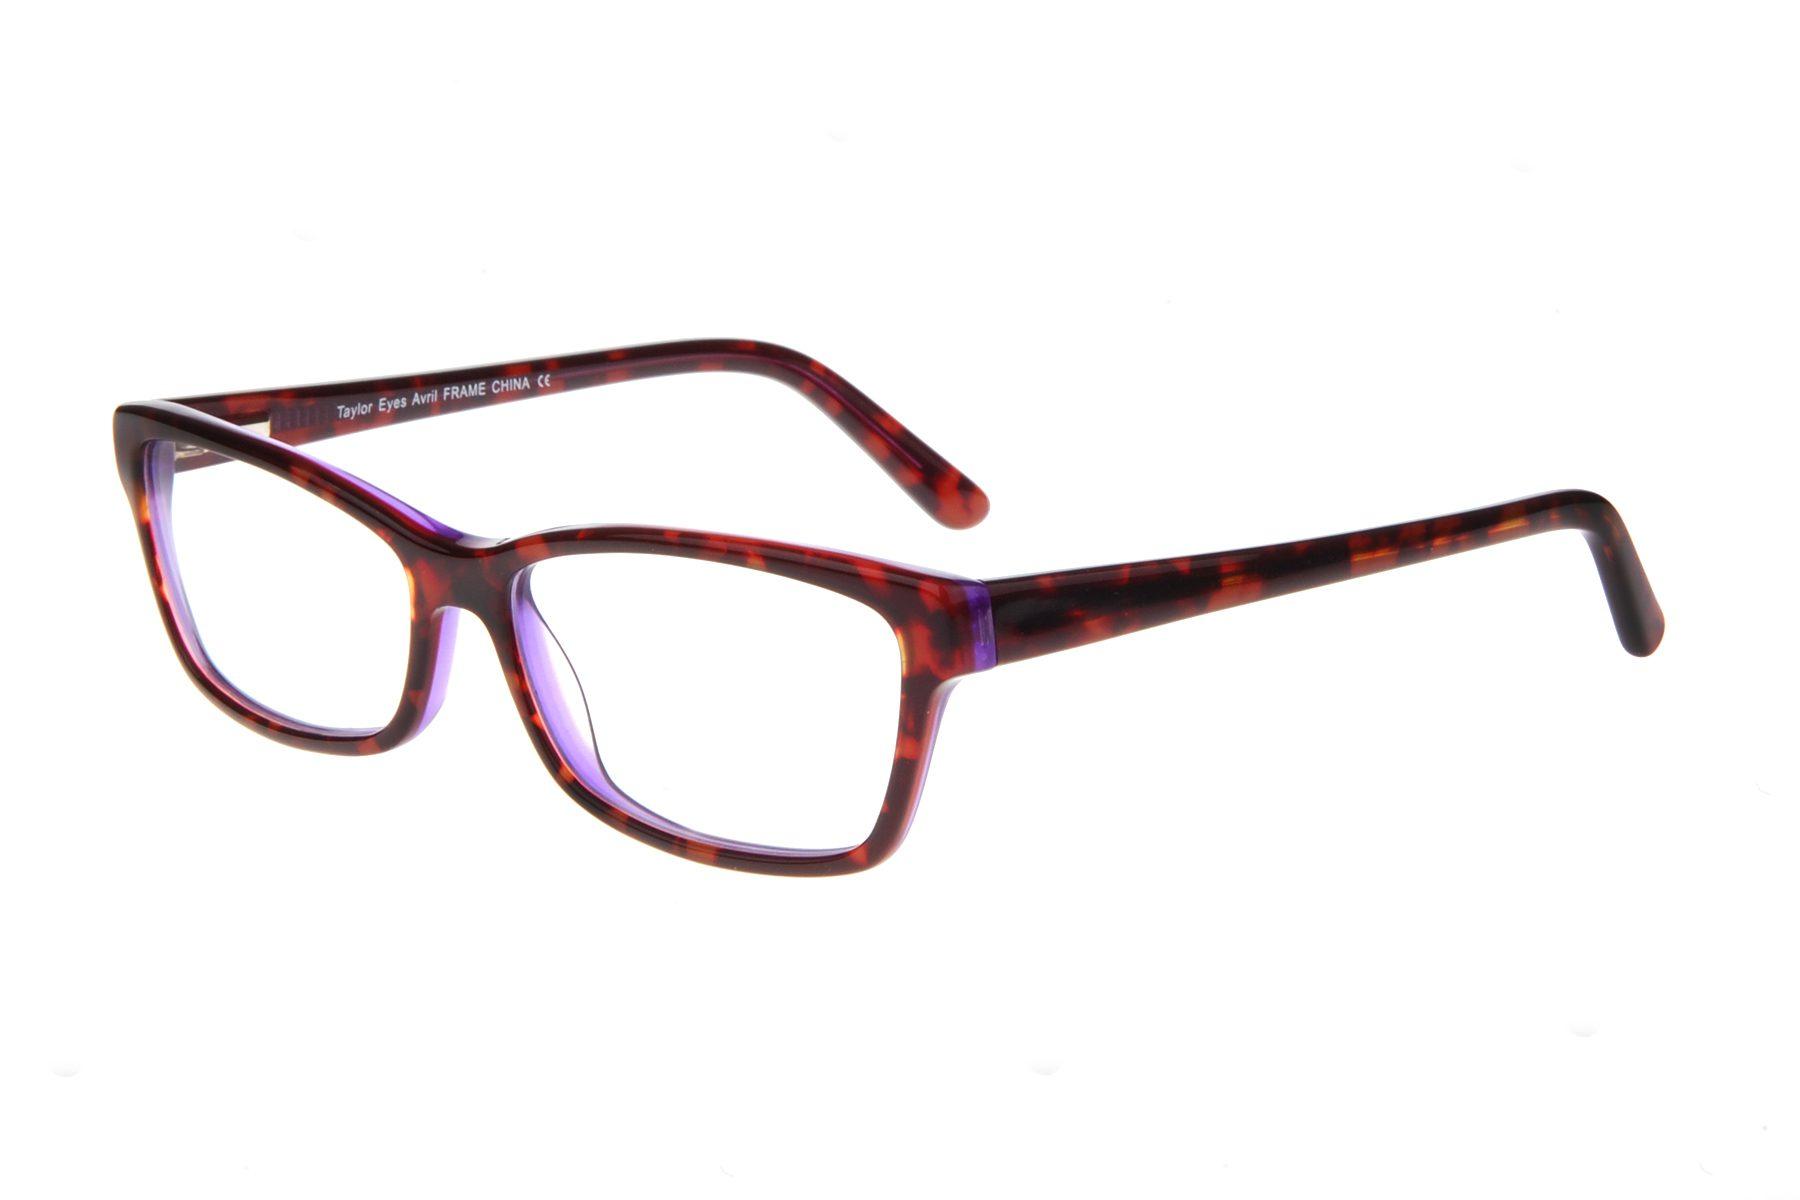 TAYLOR EYES -AVRIL DEMI/PURPURPLE - Visual Eyes Eyewear